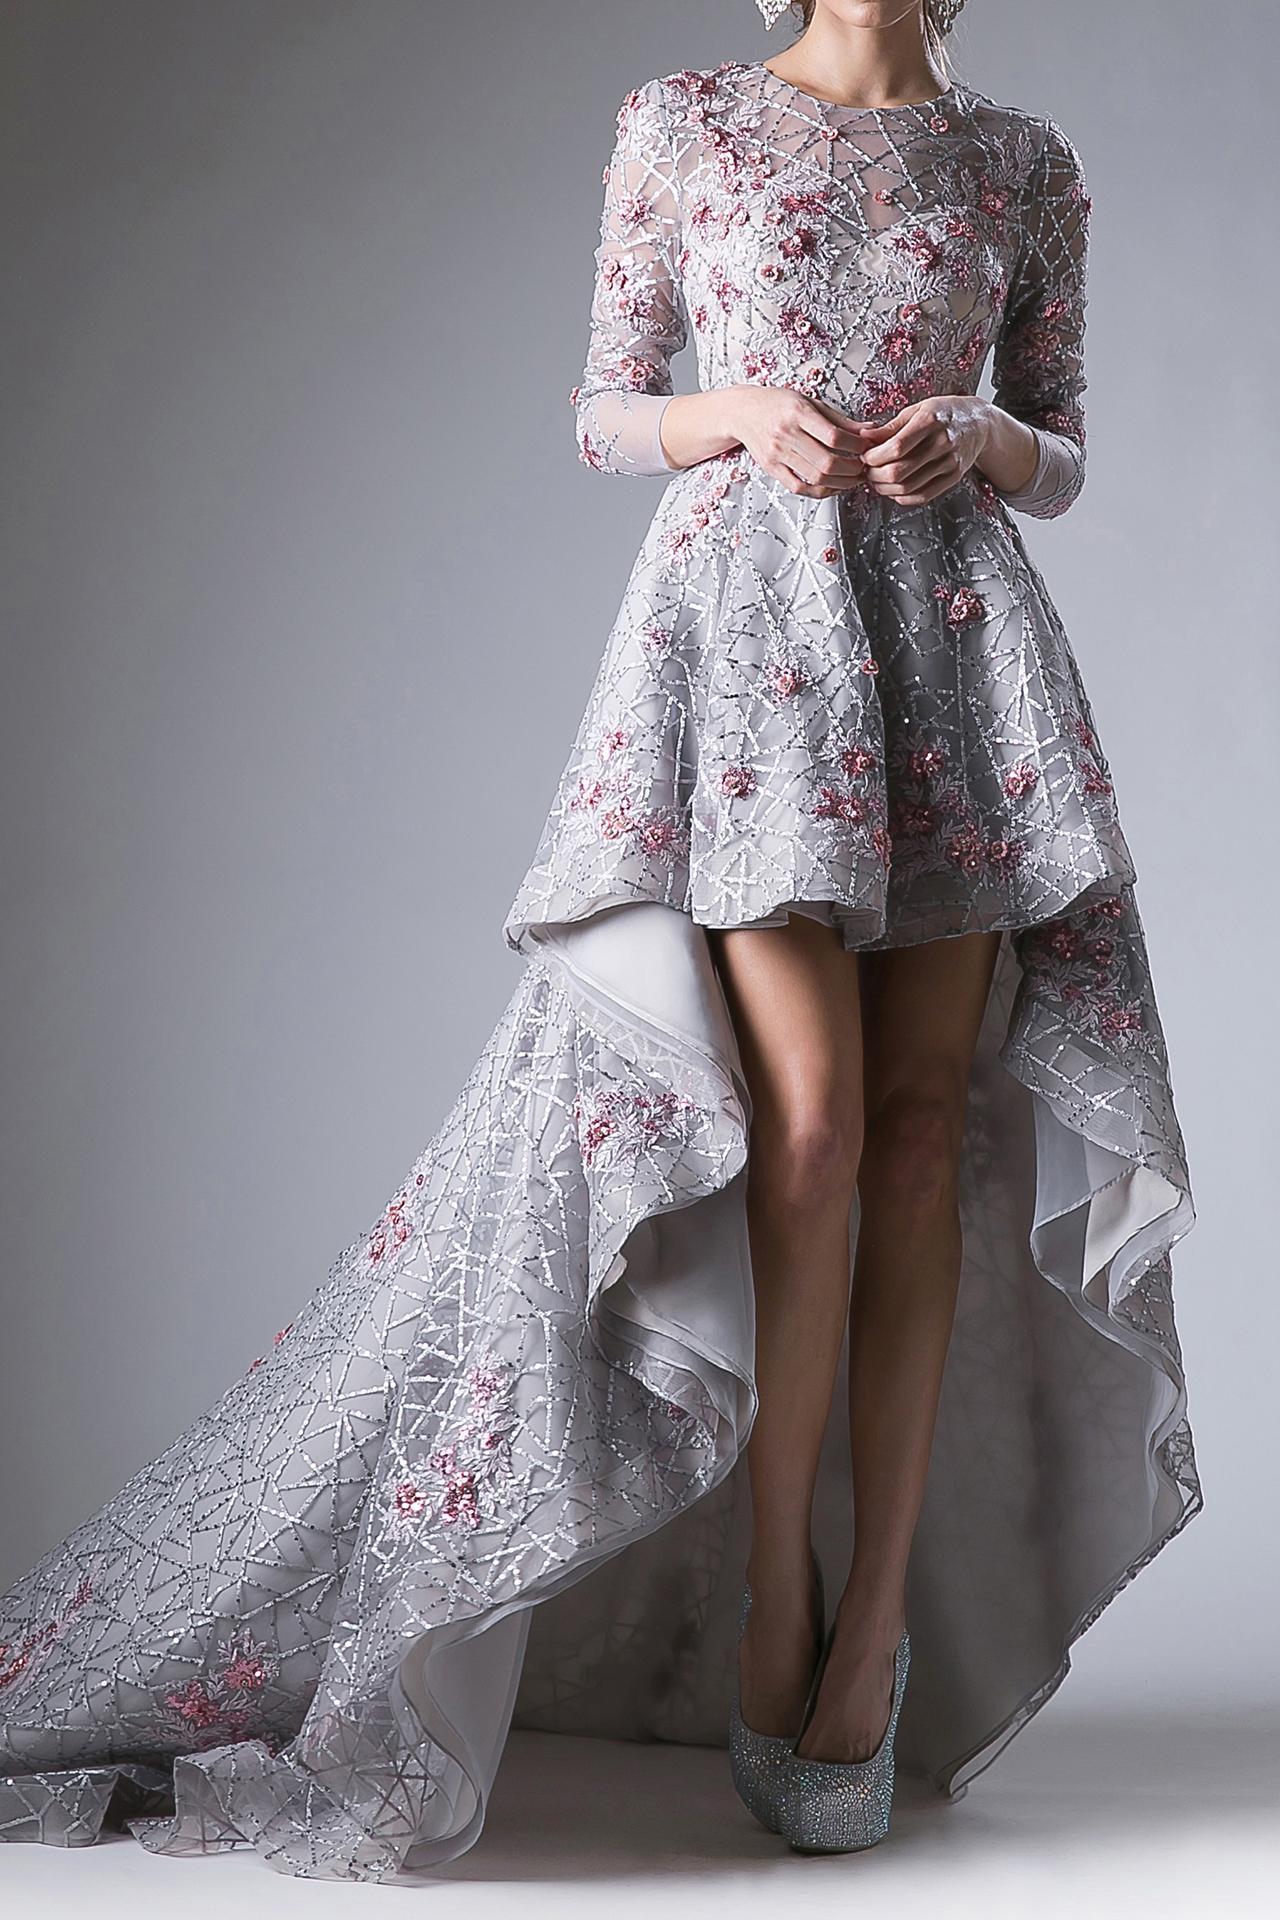 Nové spoločenské šaty :) - Obrázok č. 4